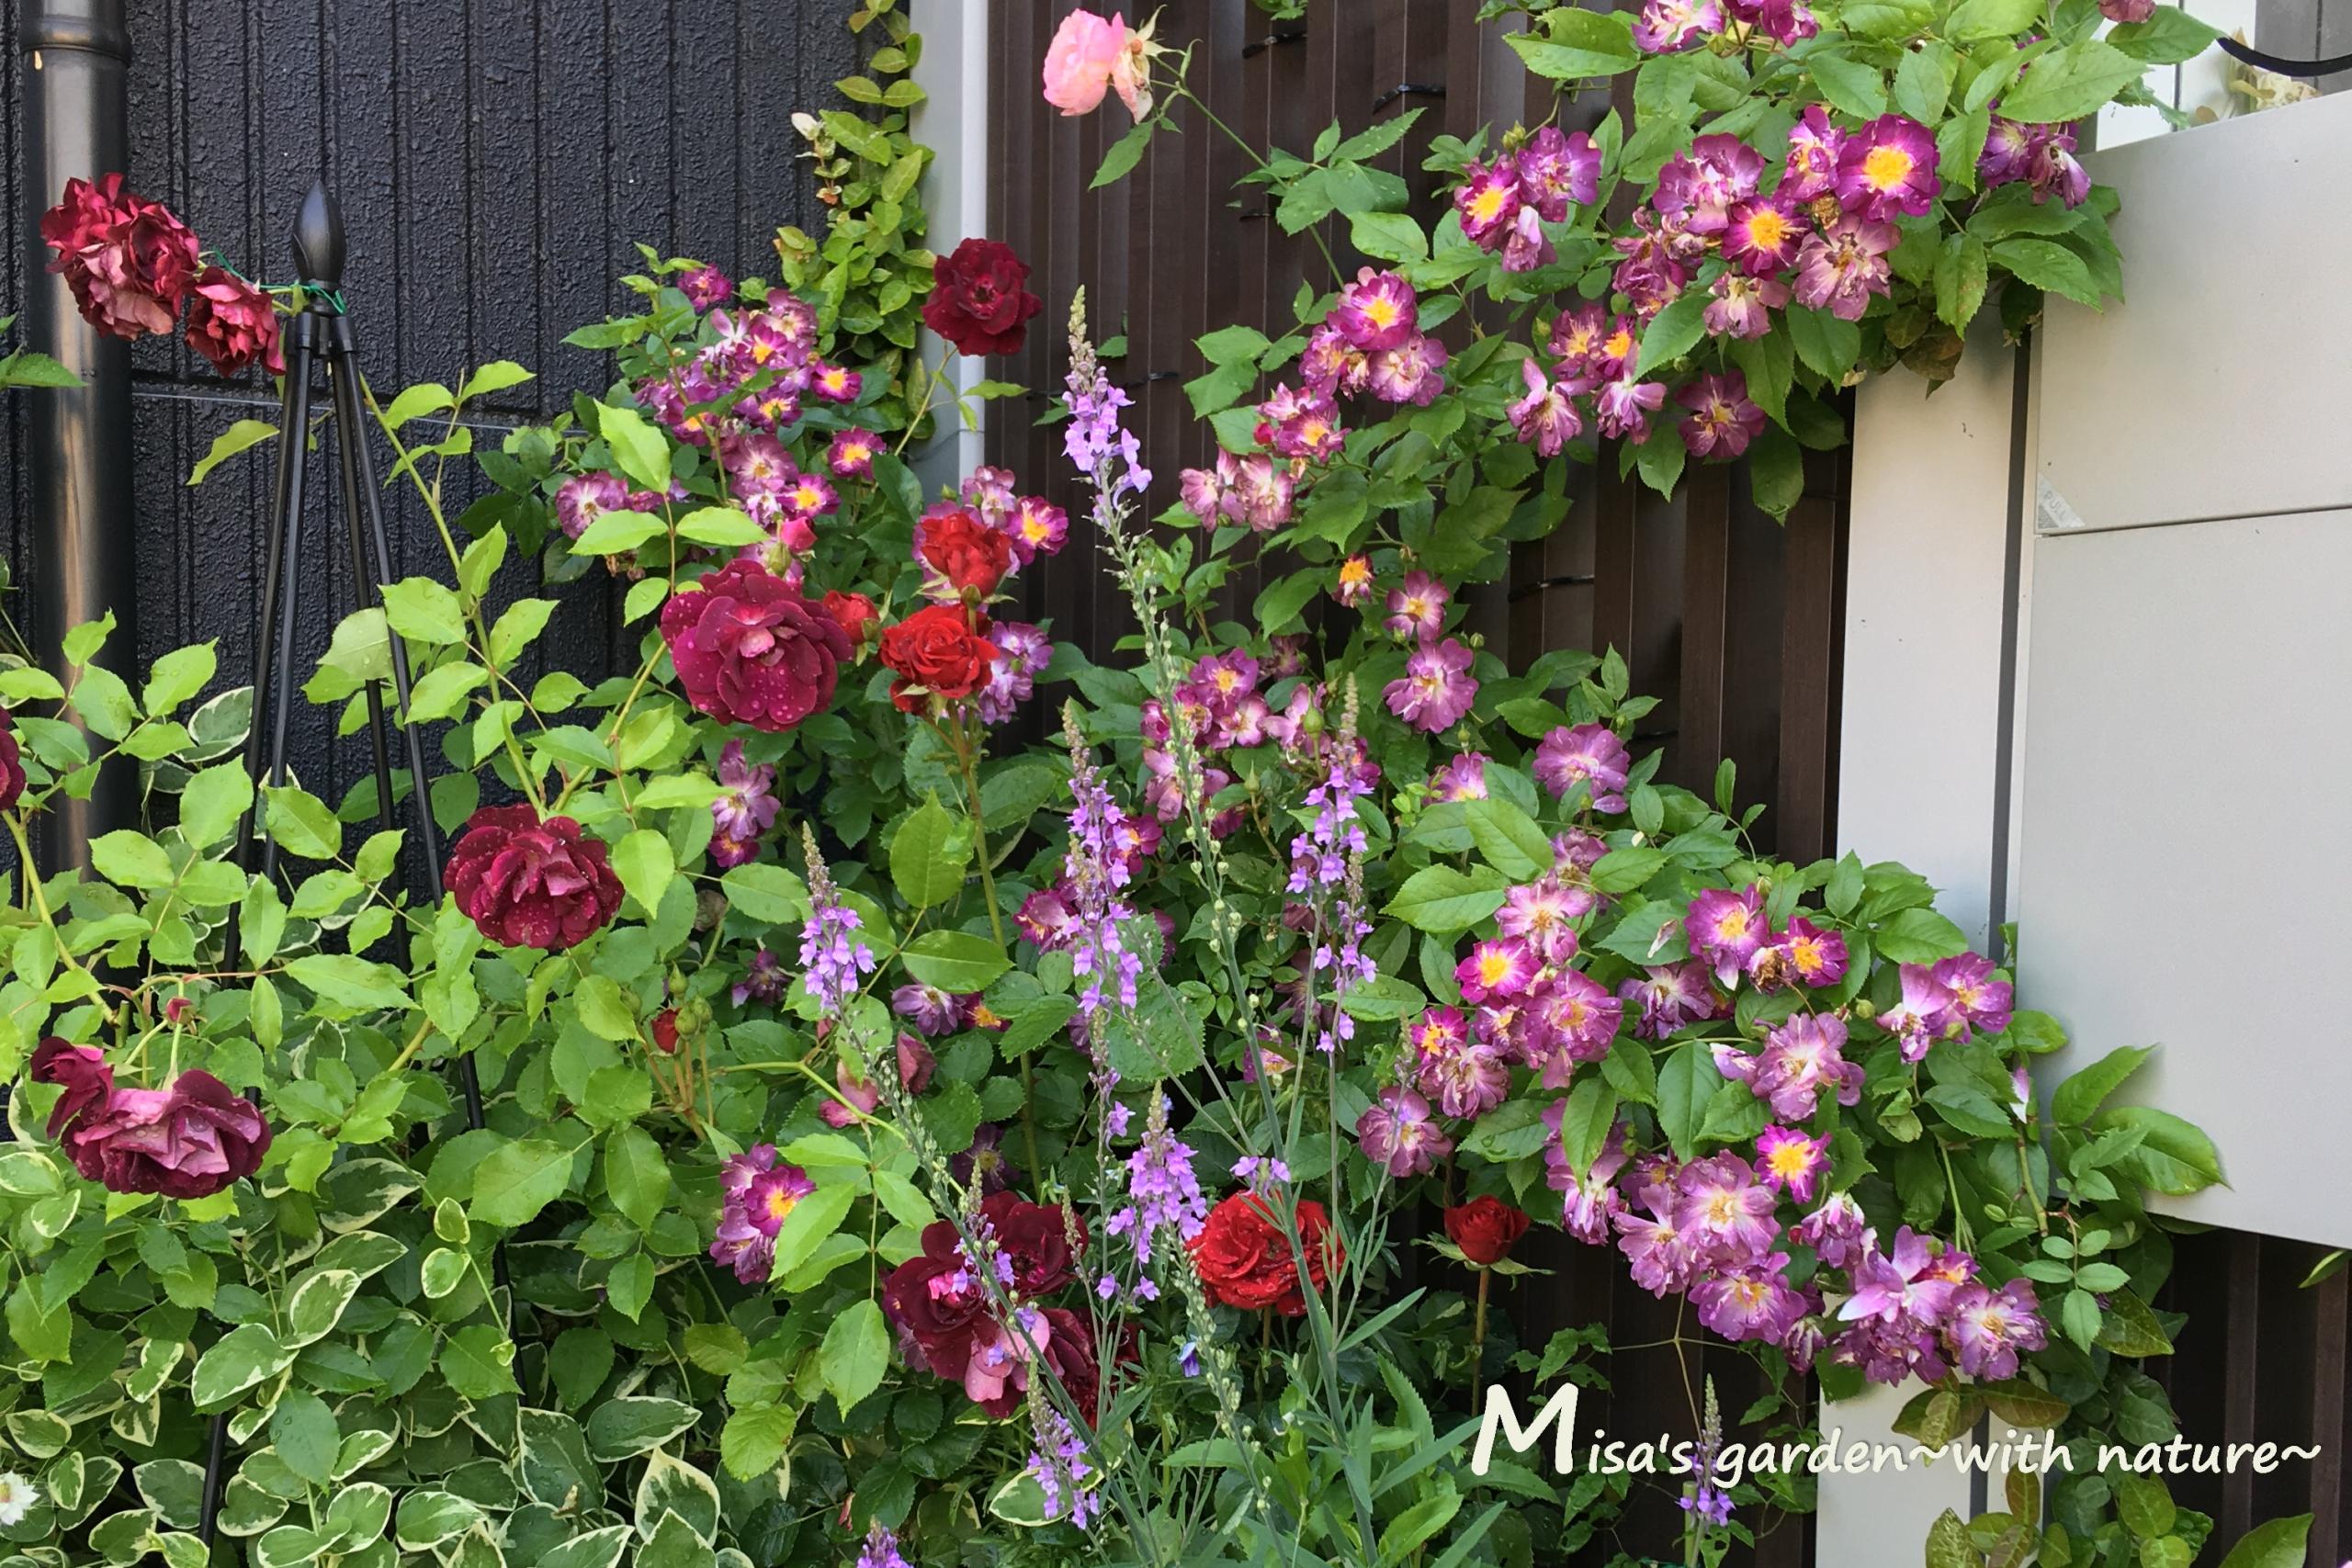 Fバーガンディアイスバーグとブルーランブラーの花壇